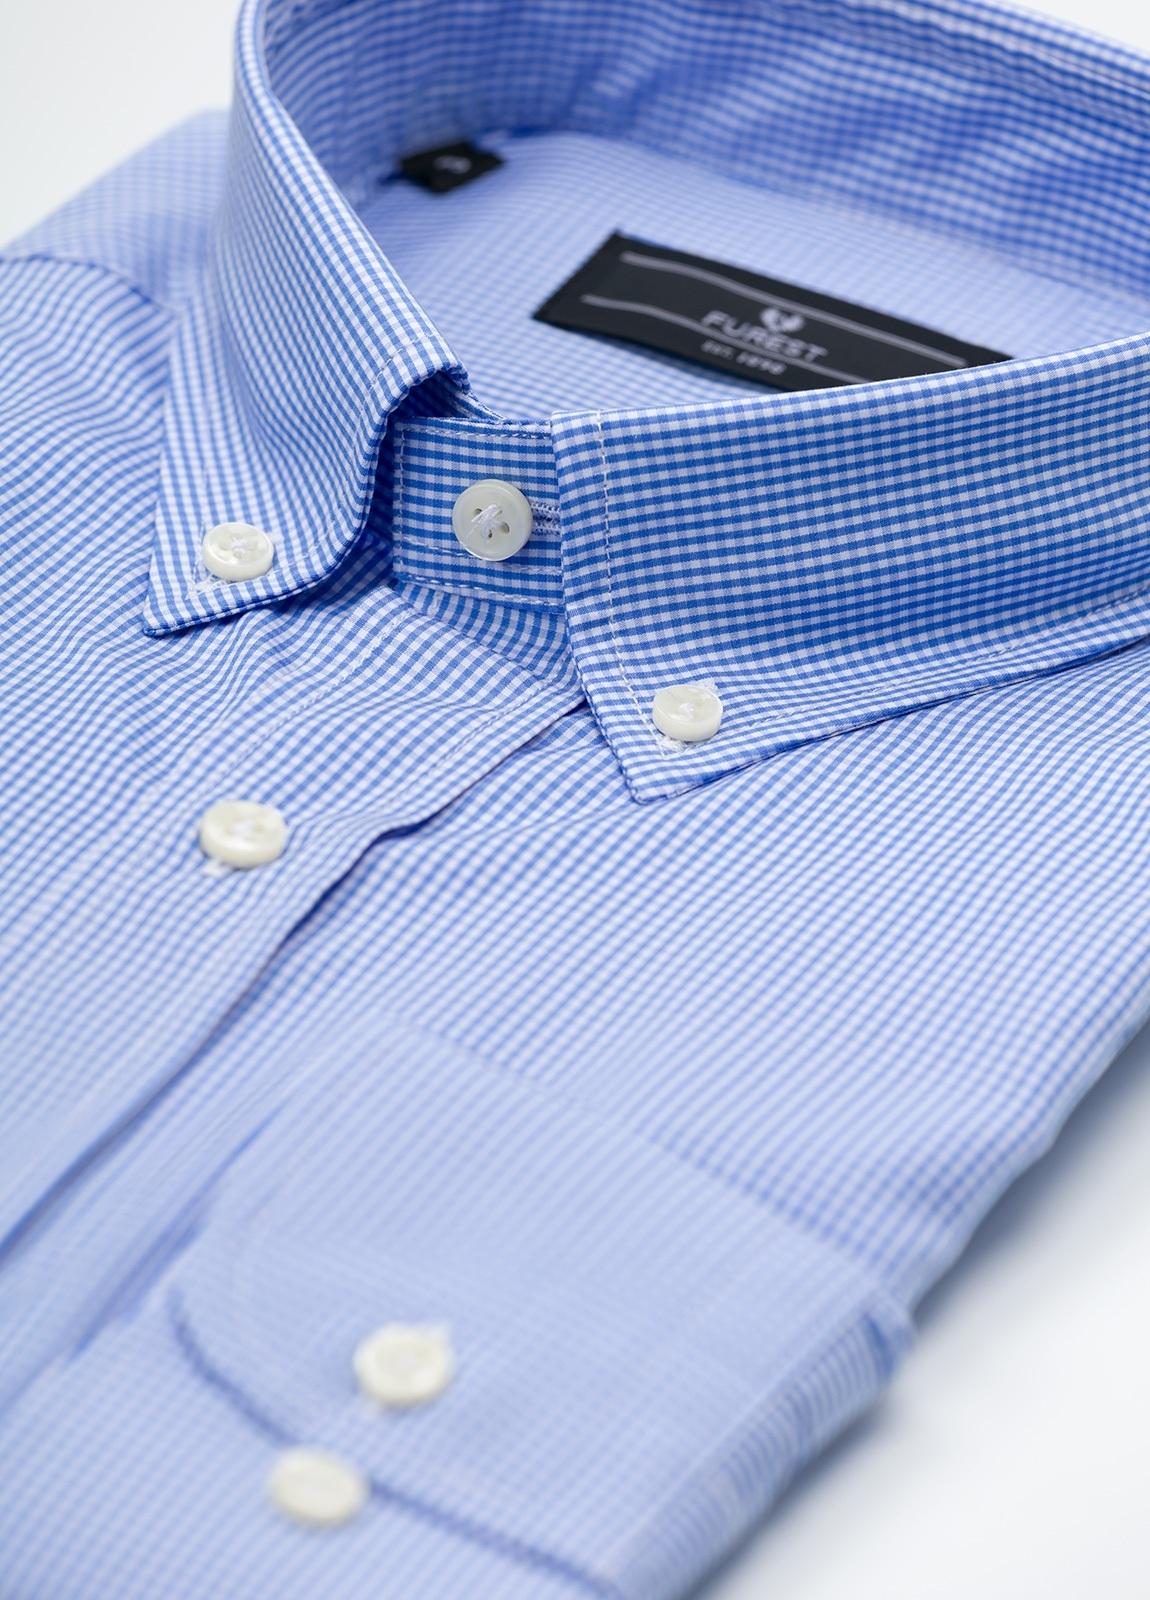 Camisa Formal Wear REGULAR FIT modelo BOTTON DOWN, con bolsillo, tejido de cuadro vichy, color azul celeste. 100% Algodón. - Ítem1